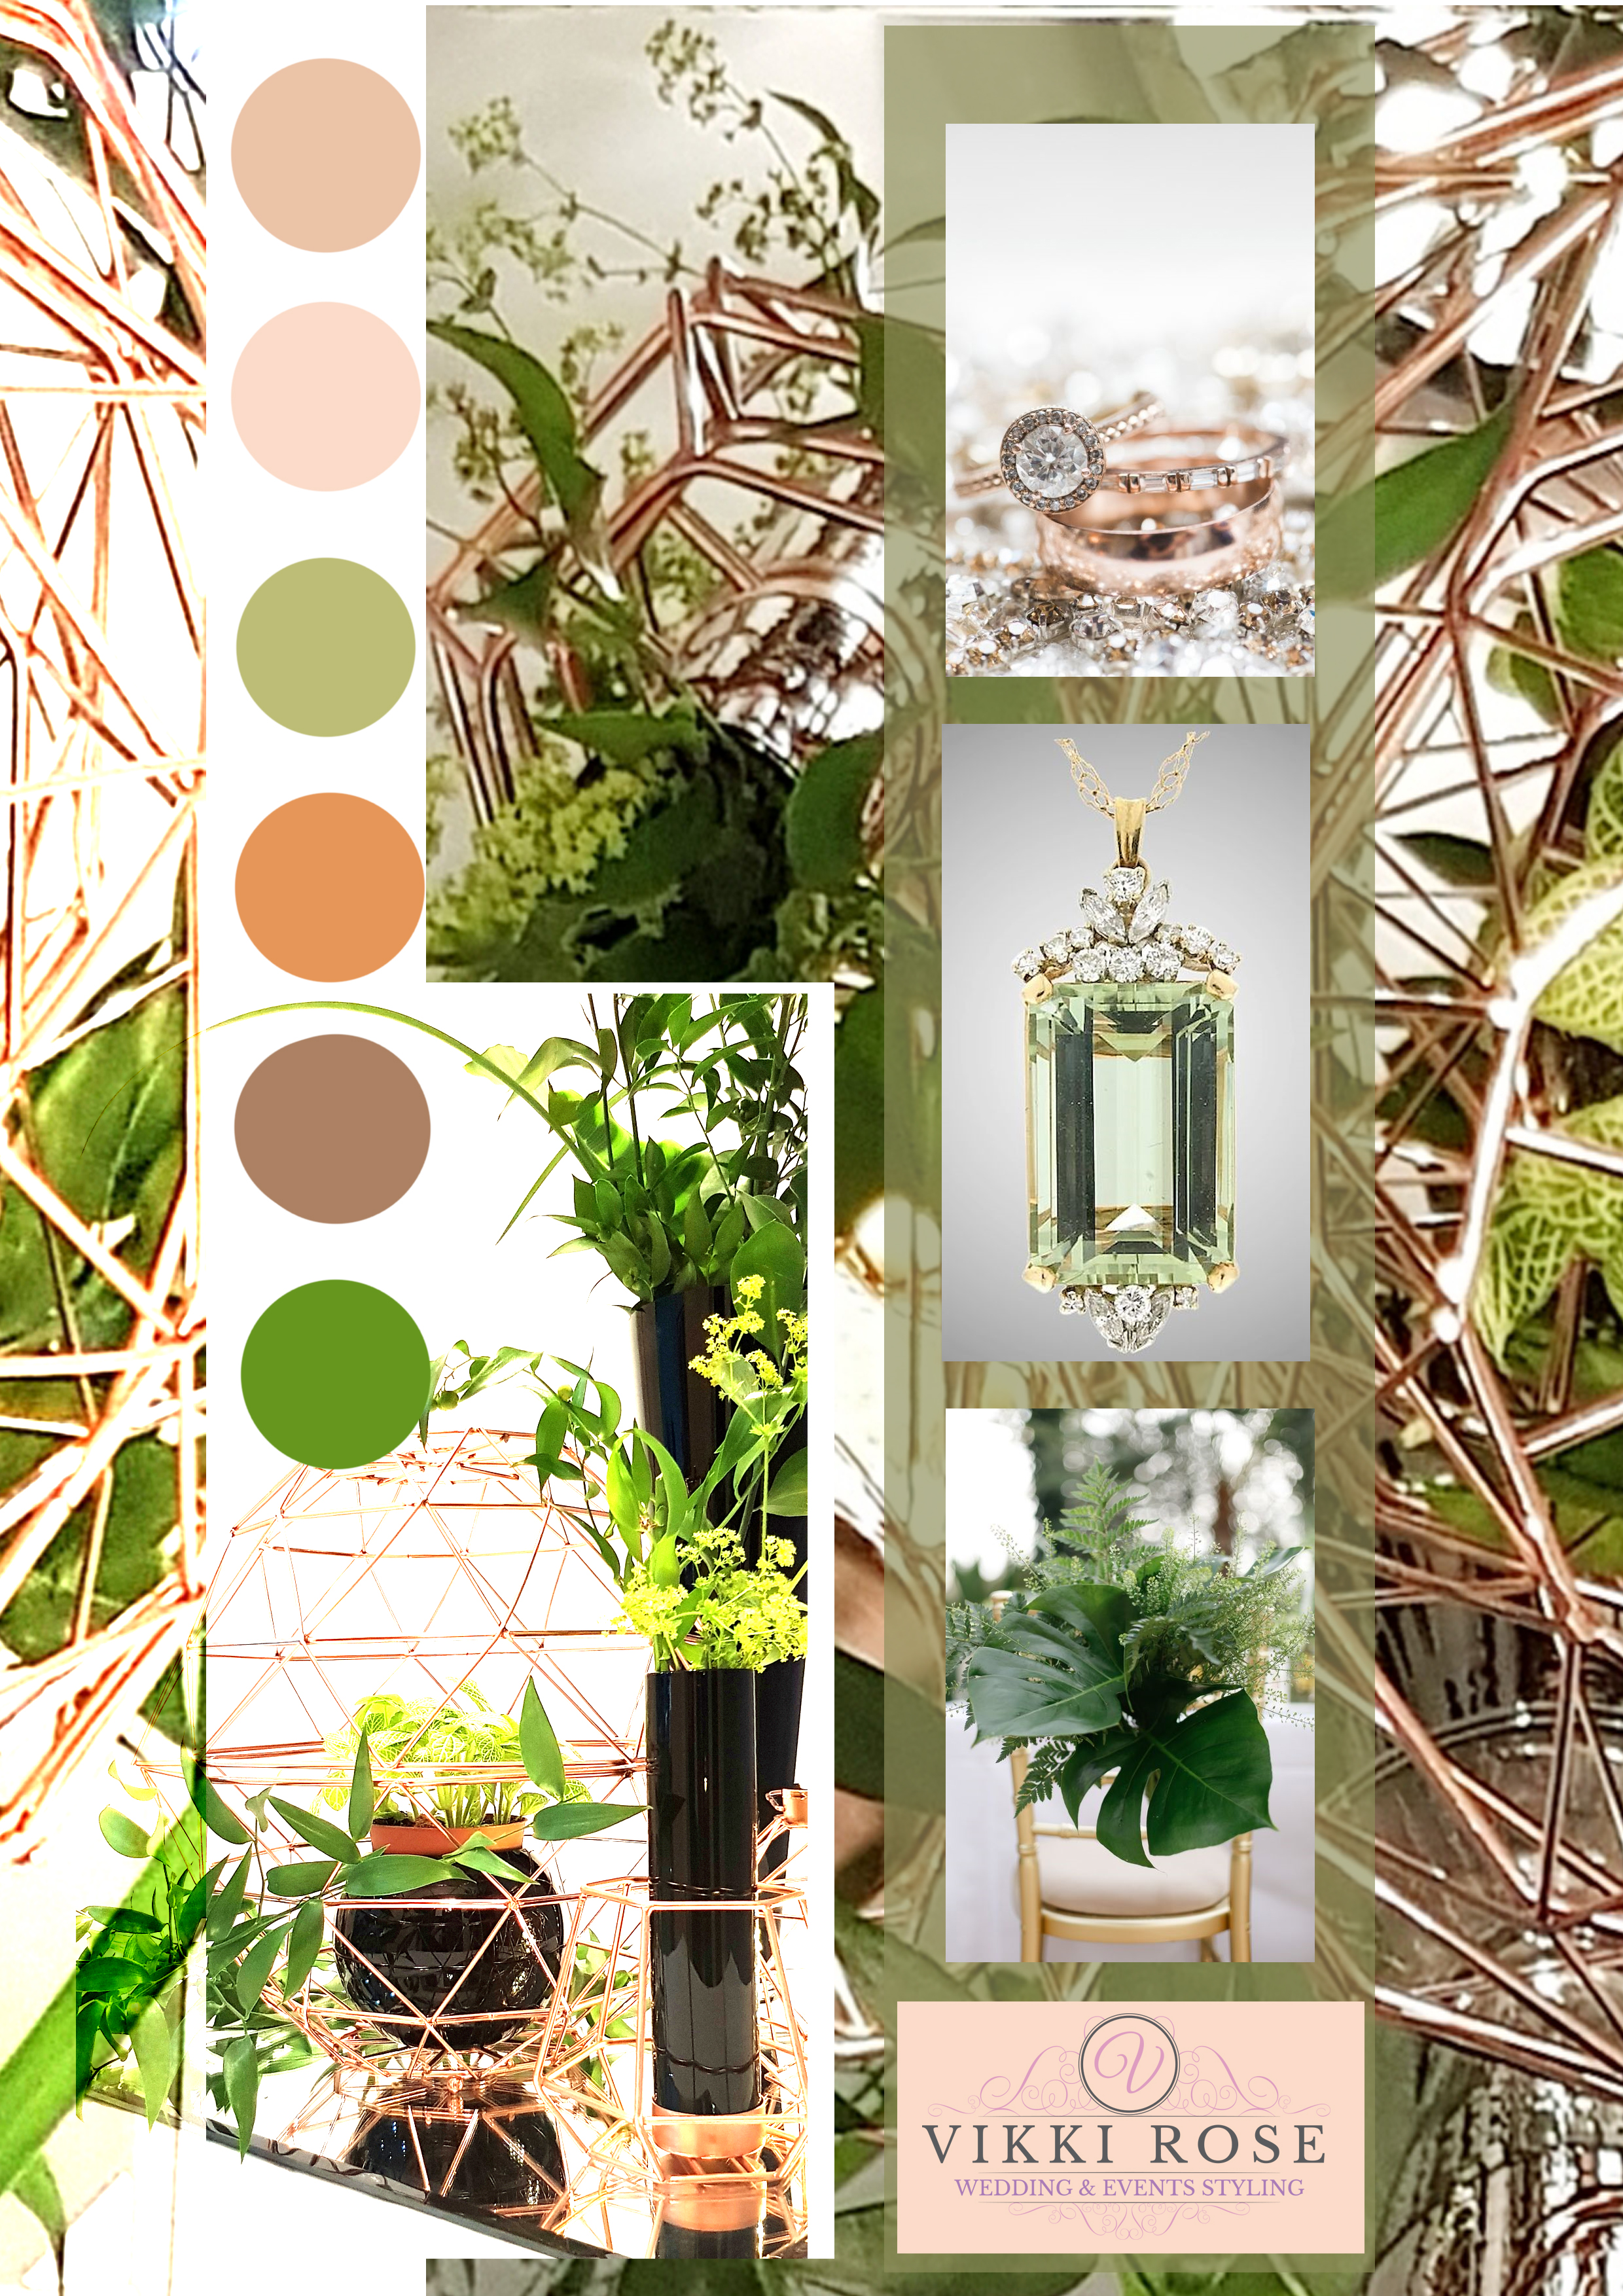 2. Use metallic to enrich your colour scheme. -